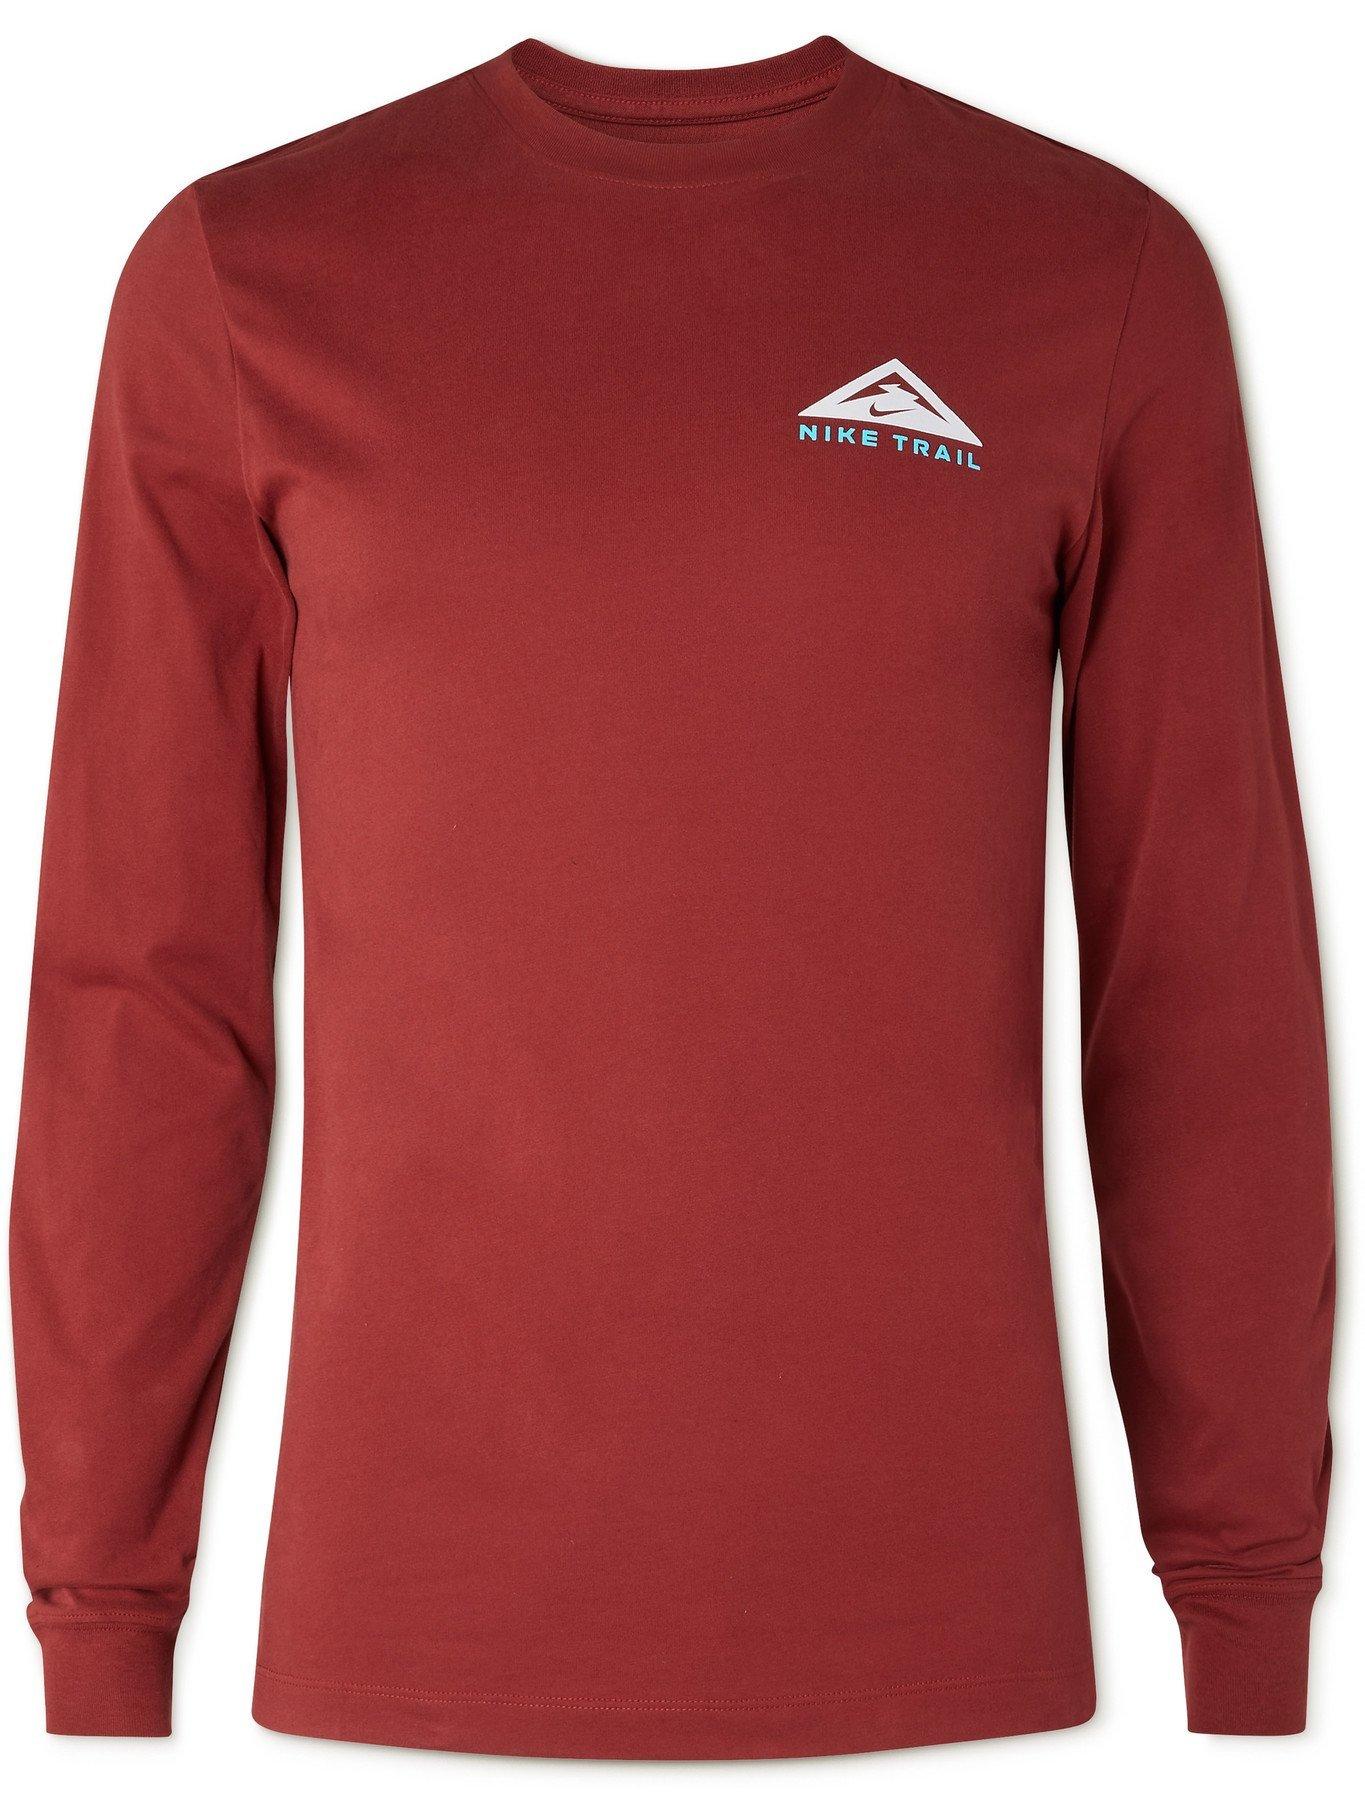 Photo: NIKE RUNNING - Trail Logo-Print Dri-FIT T-Shirt - Red